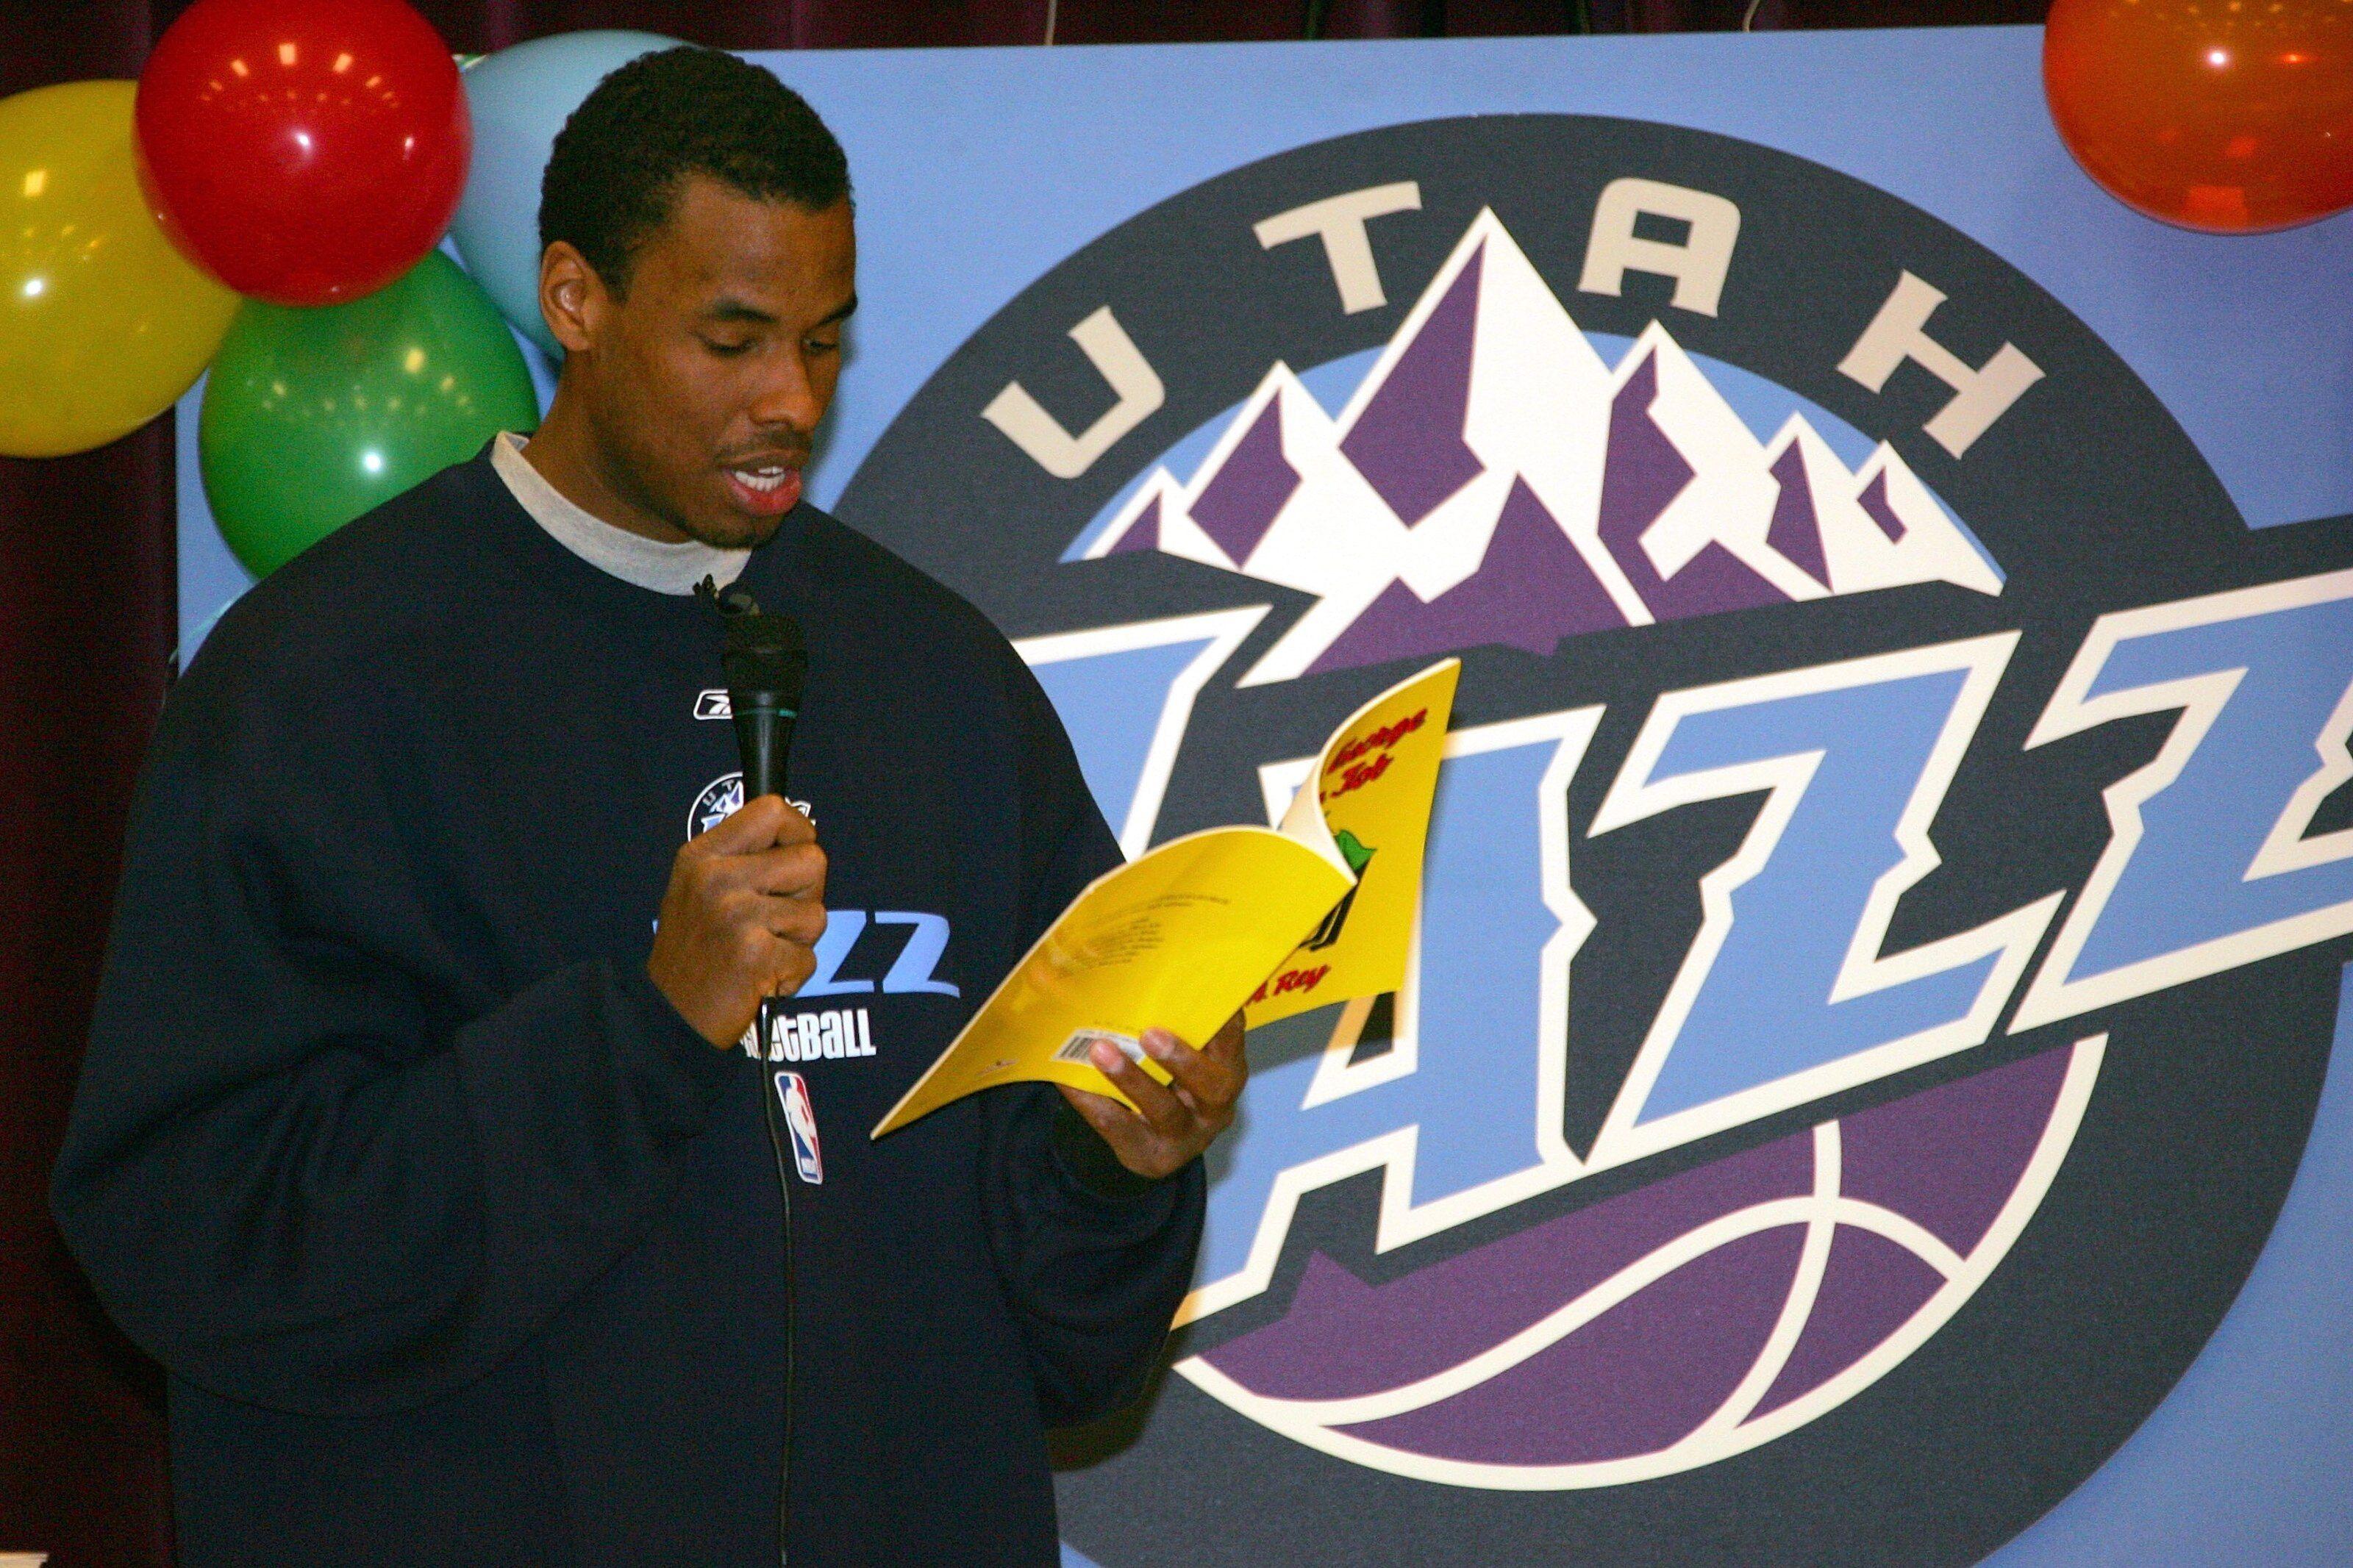 Utah Jazz alumni: Jarron Collins, Tyrone Corbin coaching update